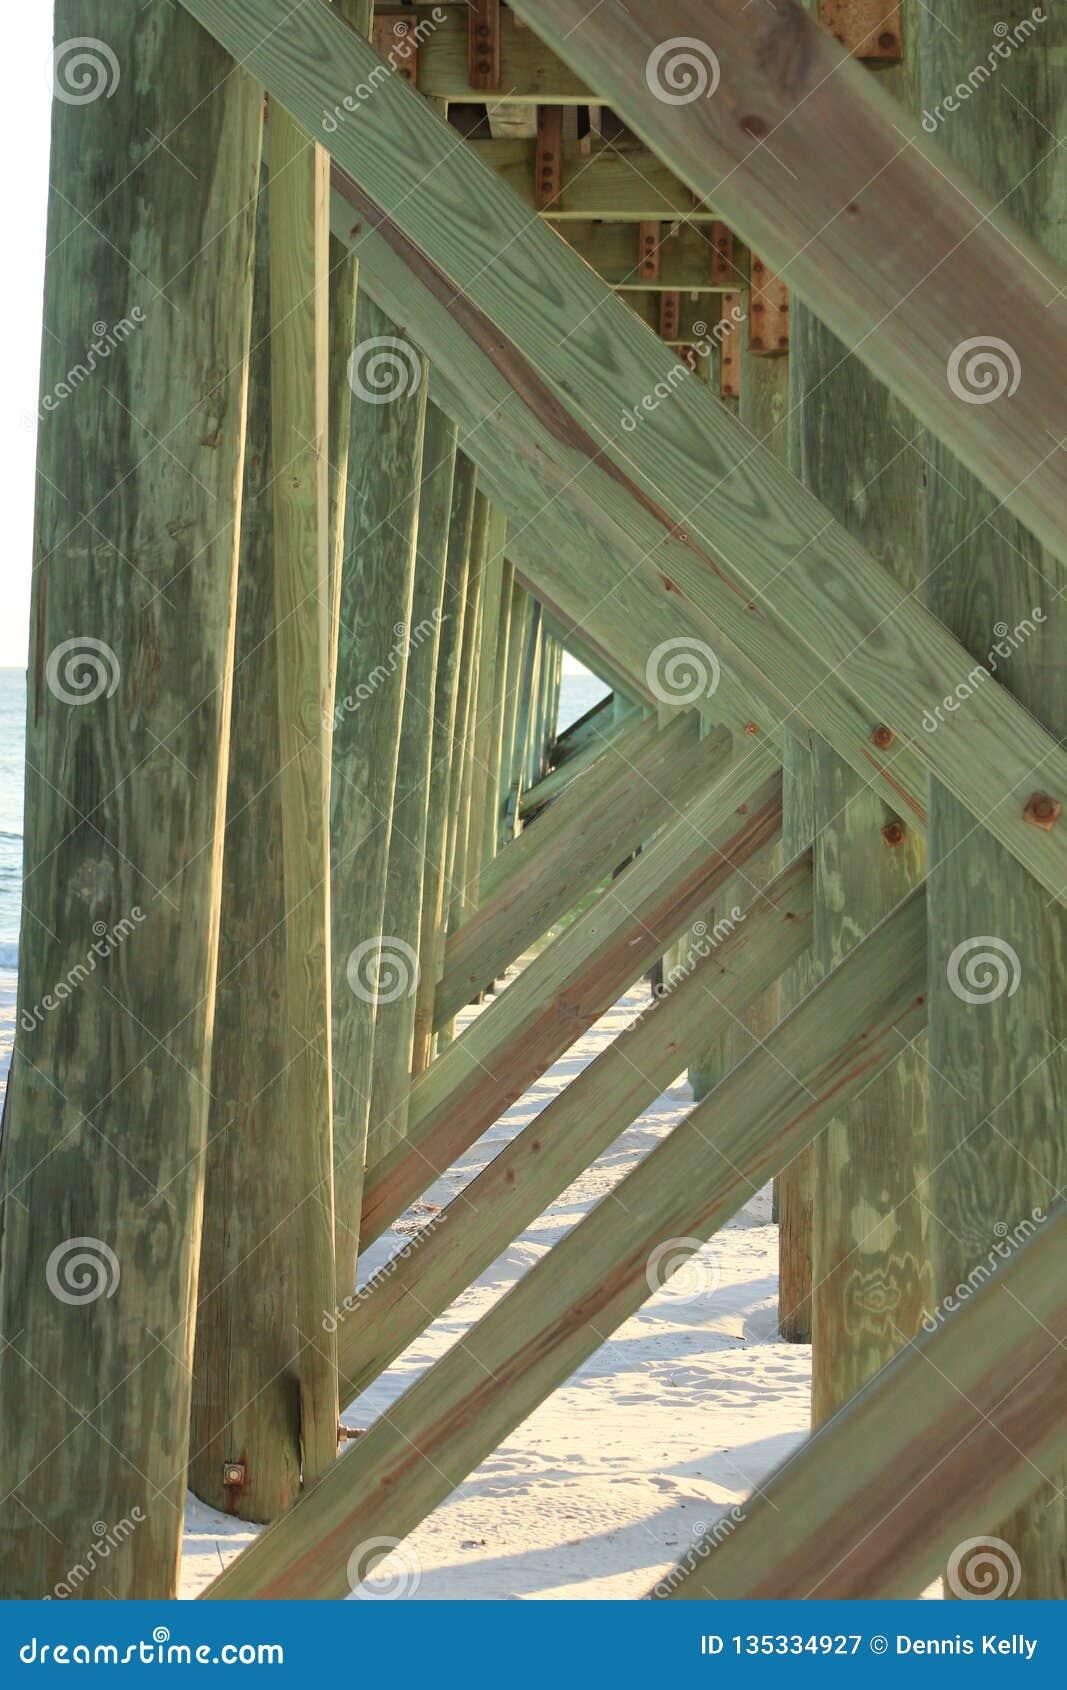 Panama city beach florida under the boardwalk pier